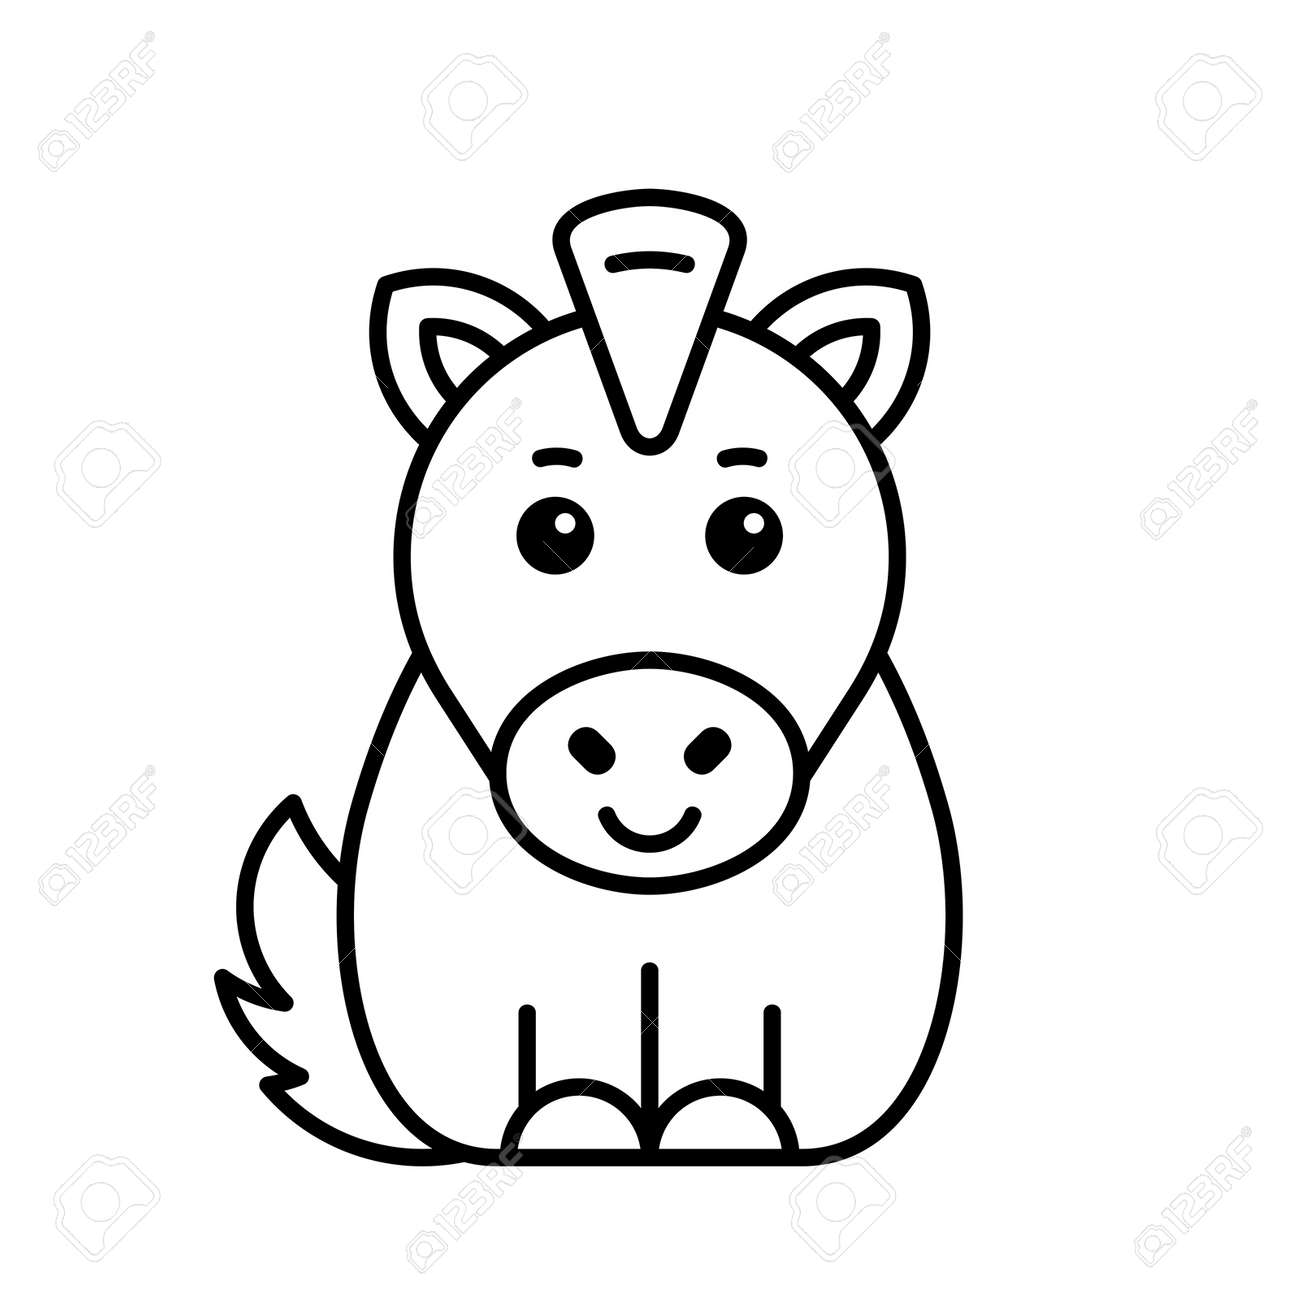 Horse icon. Icon design. Template elements - 171231704